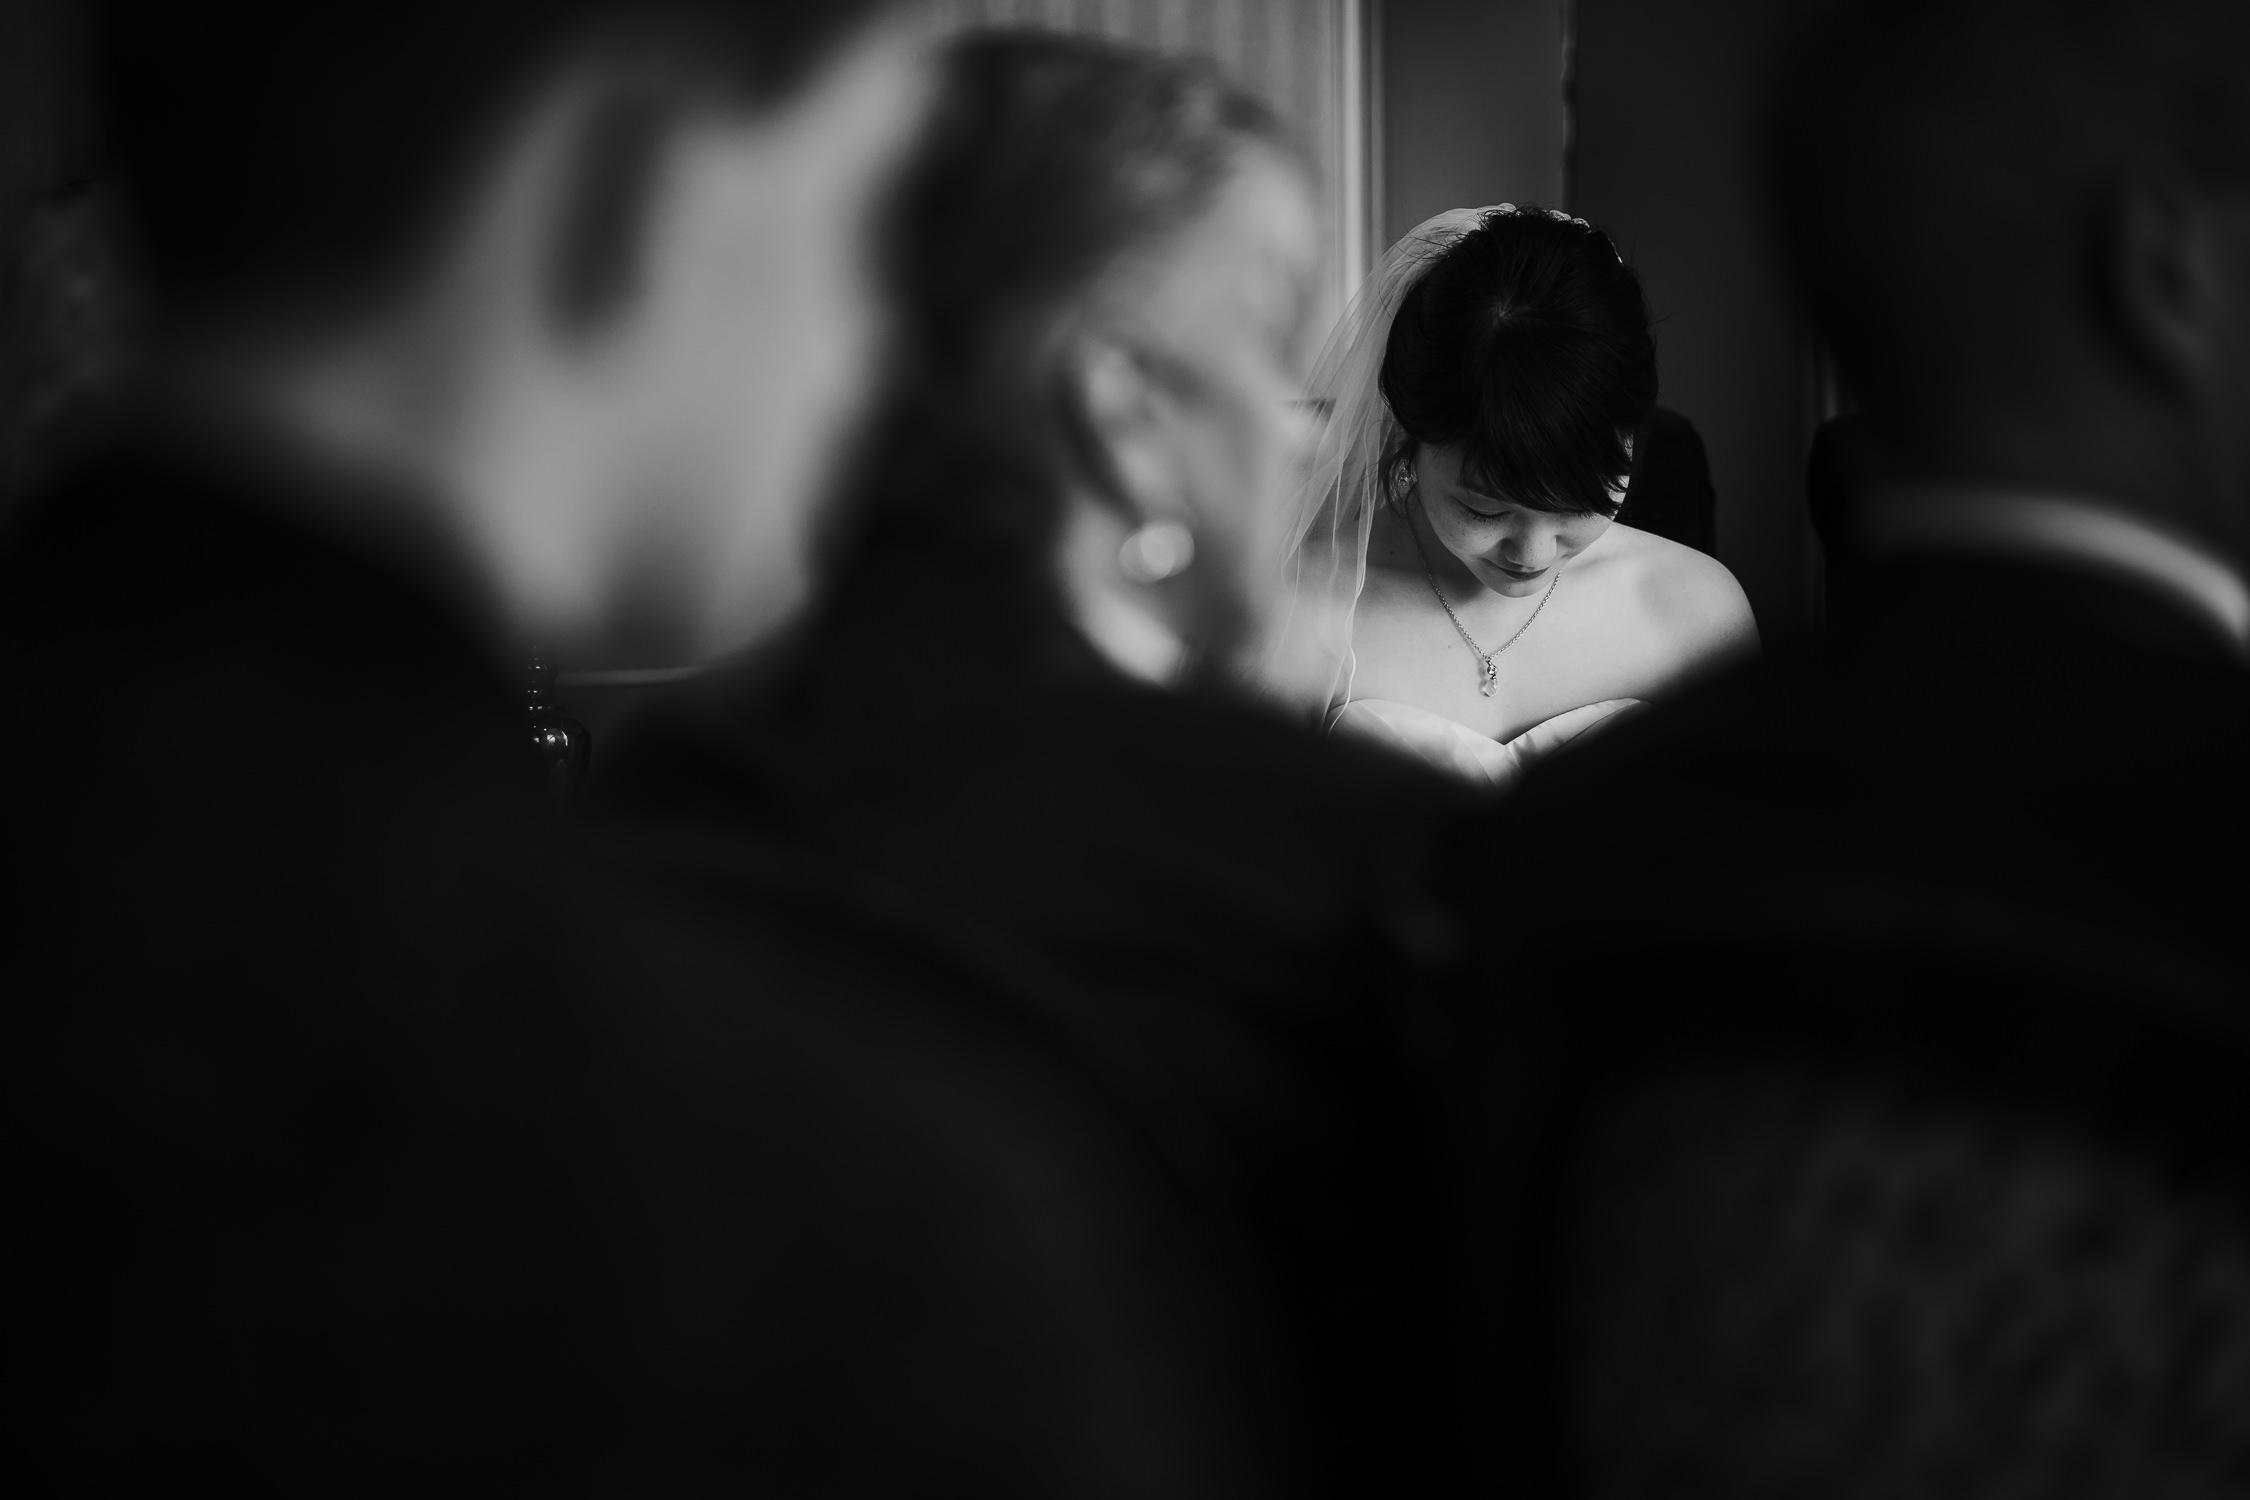 bruidsfotografie-amsterdam-utrecht-trouwfotograaf-mark-hadden-wedding-photography-Yun & Geert-167-2.jpg